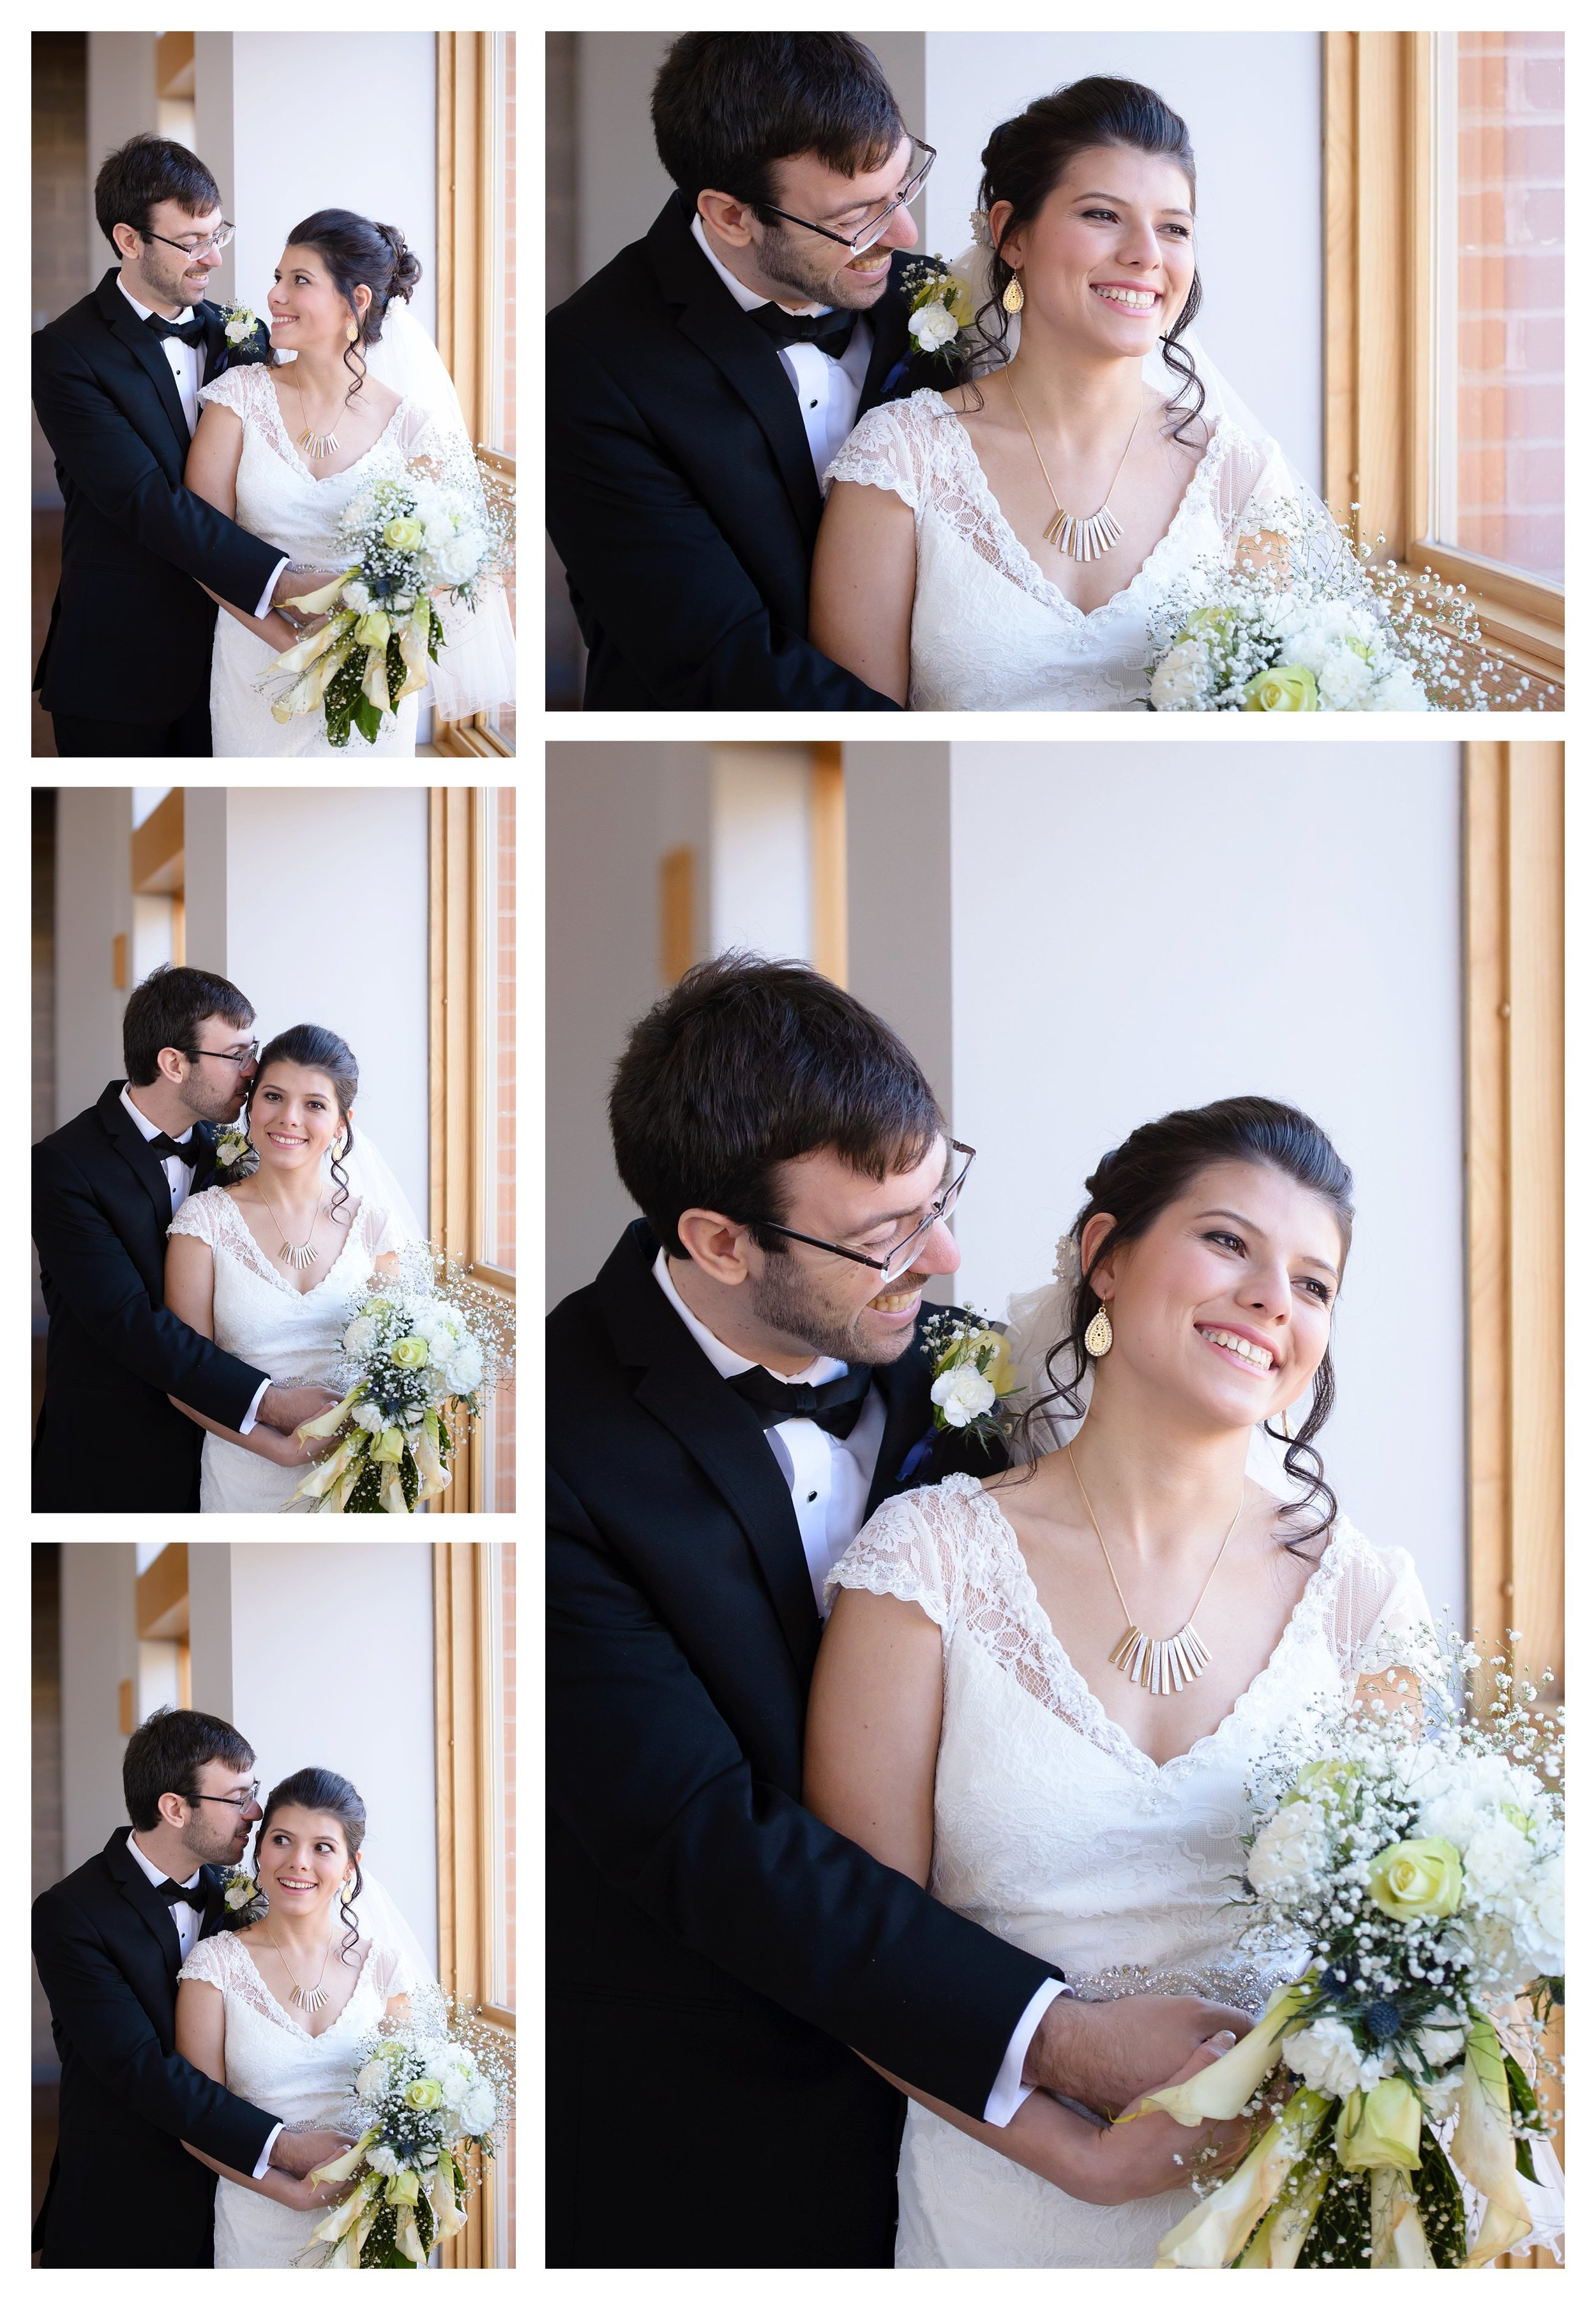 ashland wedding photographer iron river brule wisconsin ps 139 photography jen jensen_0140.jpg